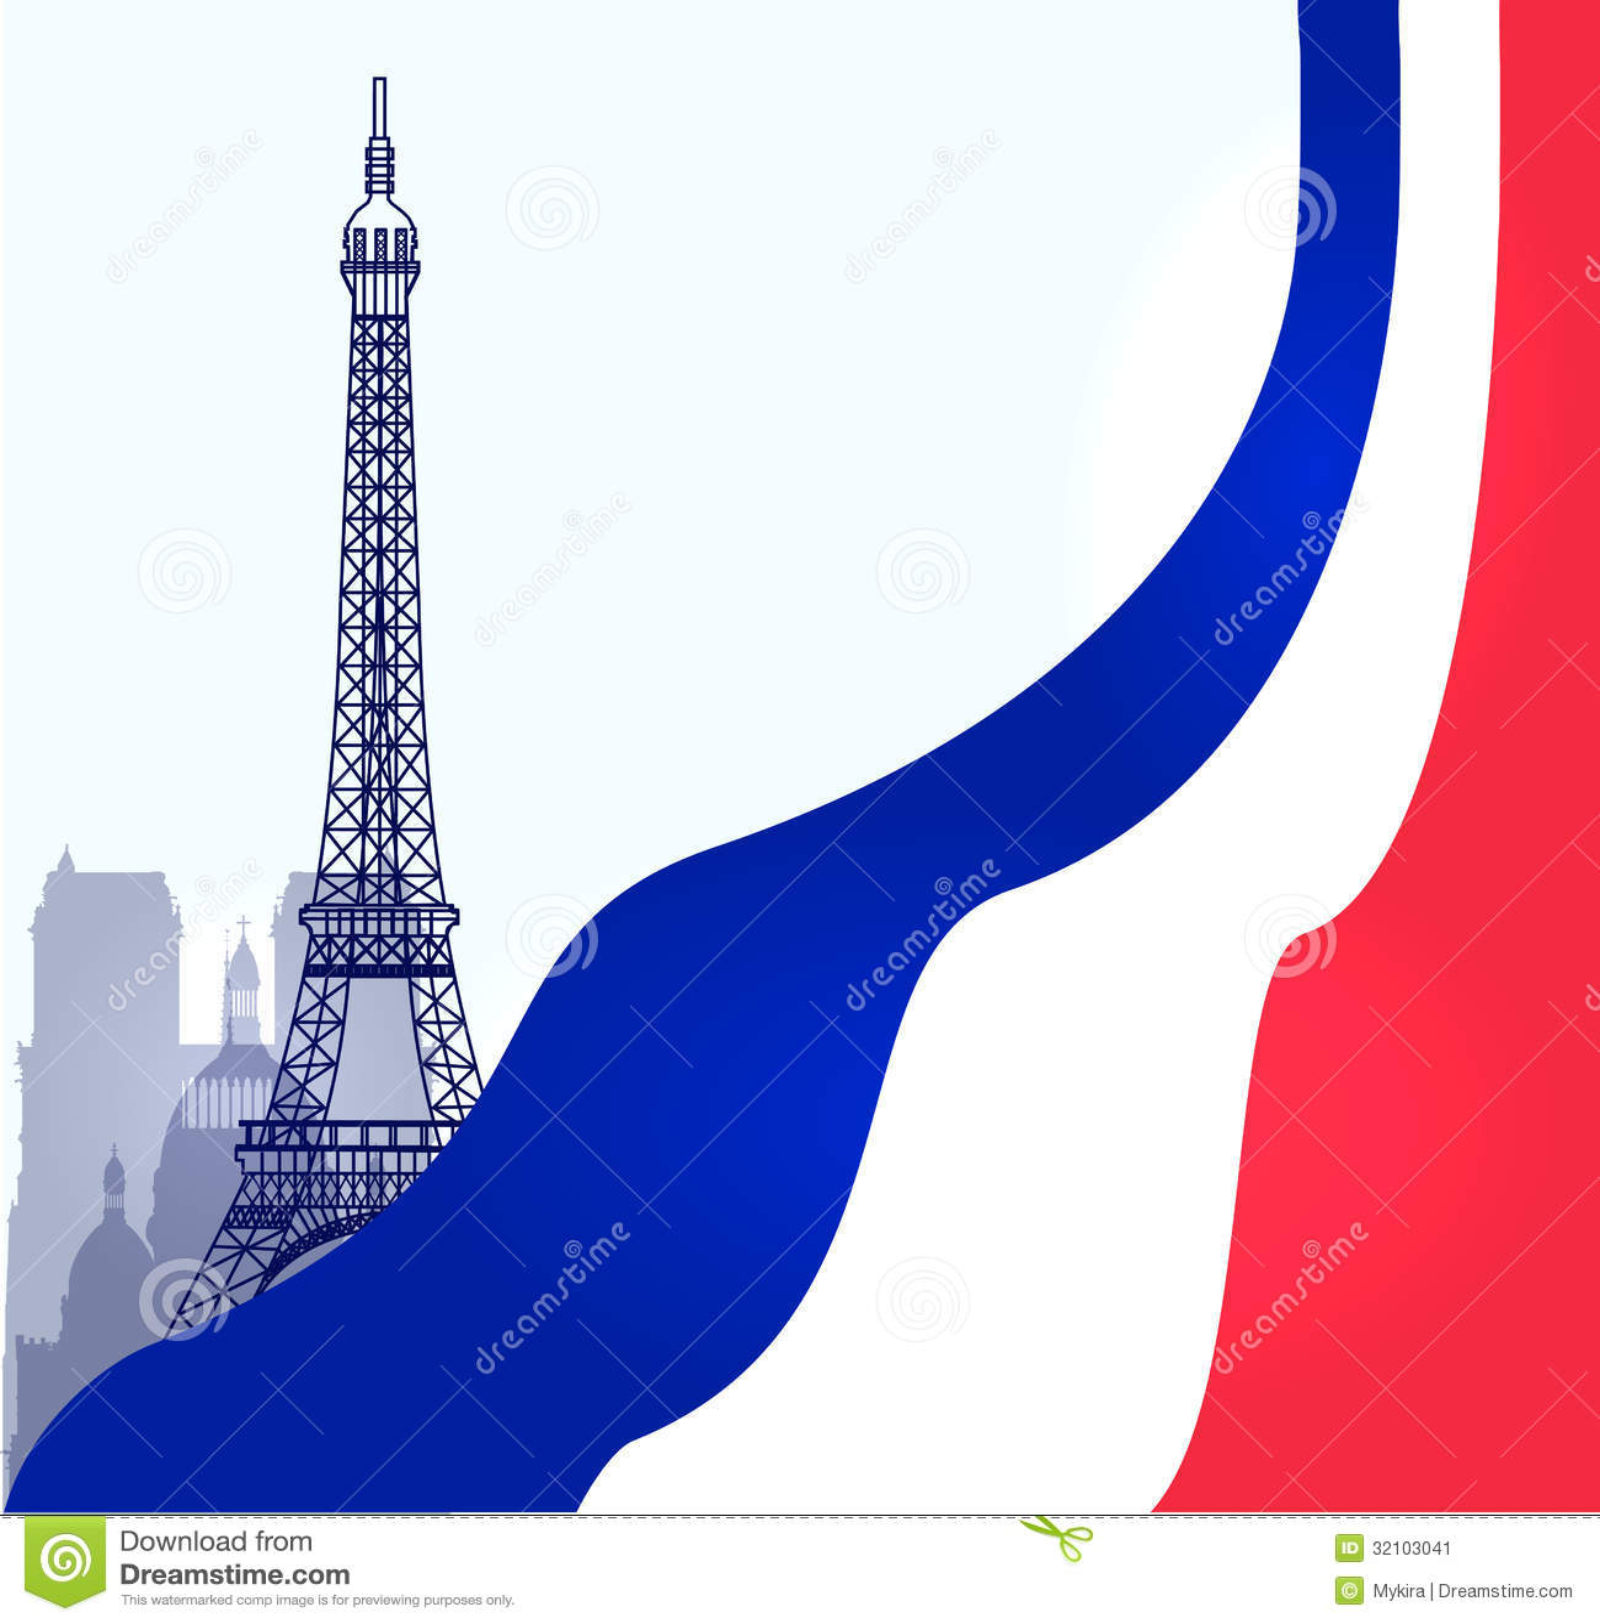 ... Paris Illustration With French Flag Stock Image - Image: 32103041